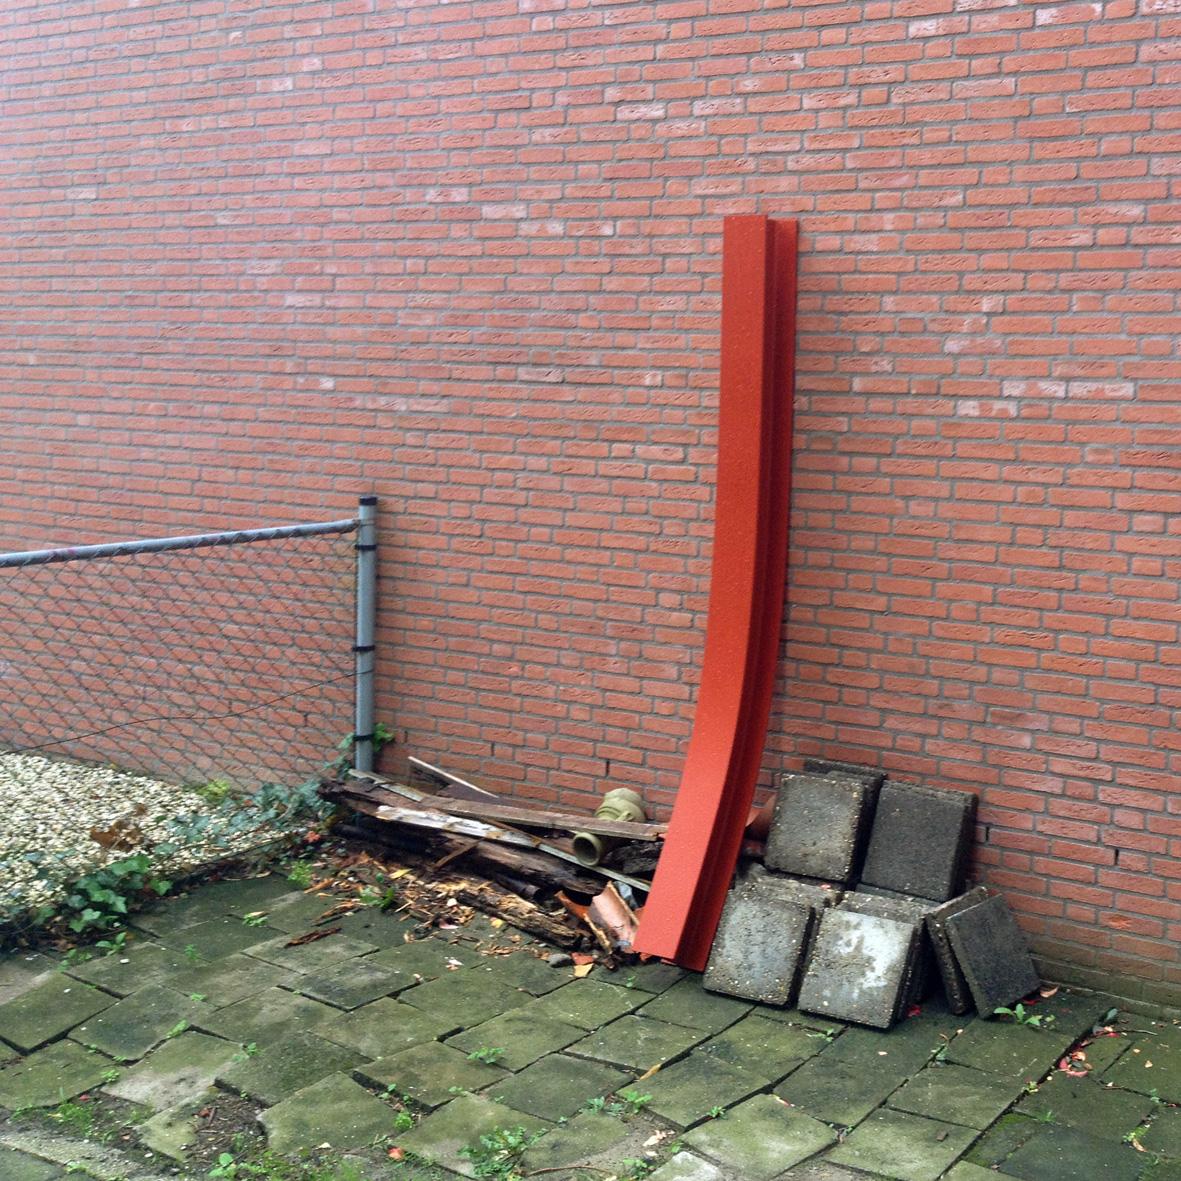 Adaptability of a abandoned steel beam_roeland_tweelinckx